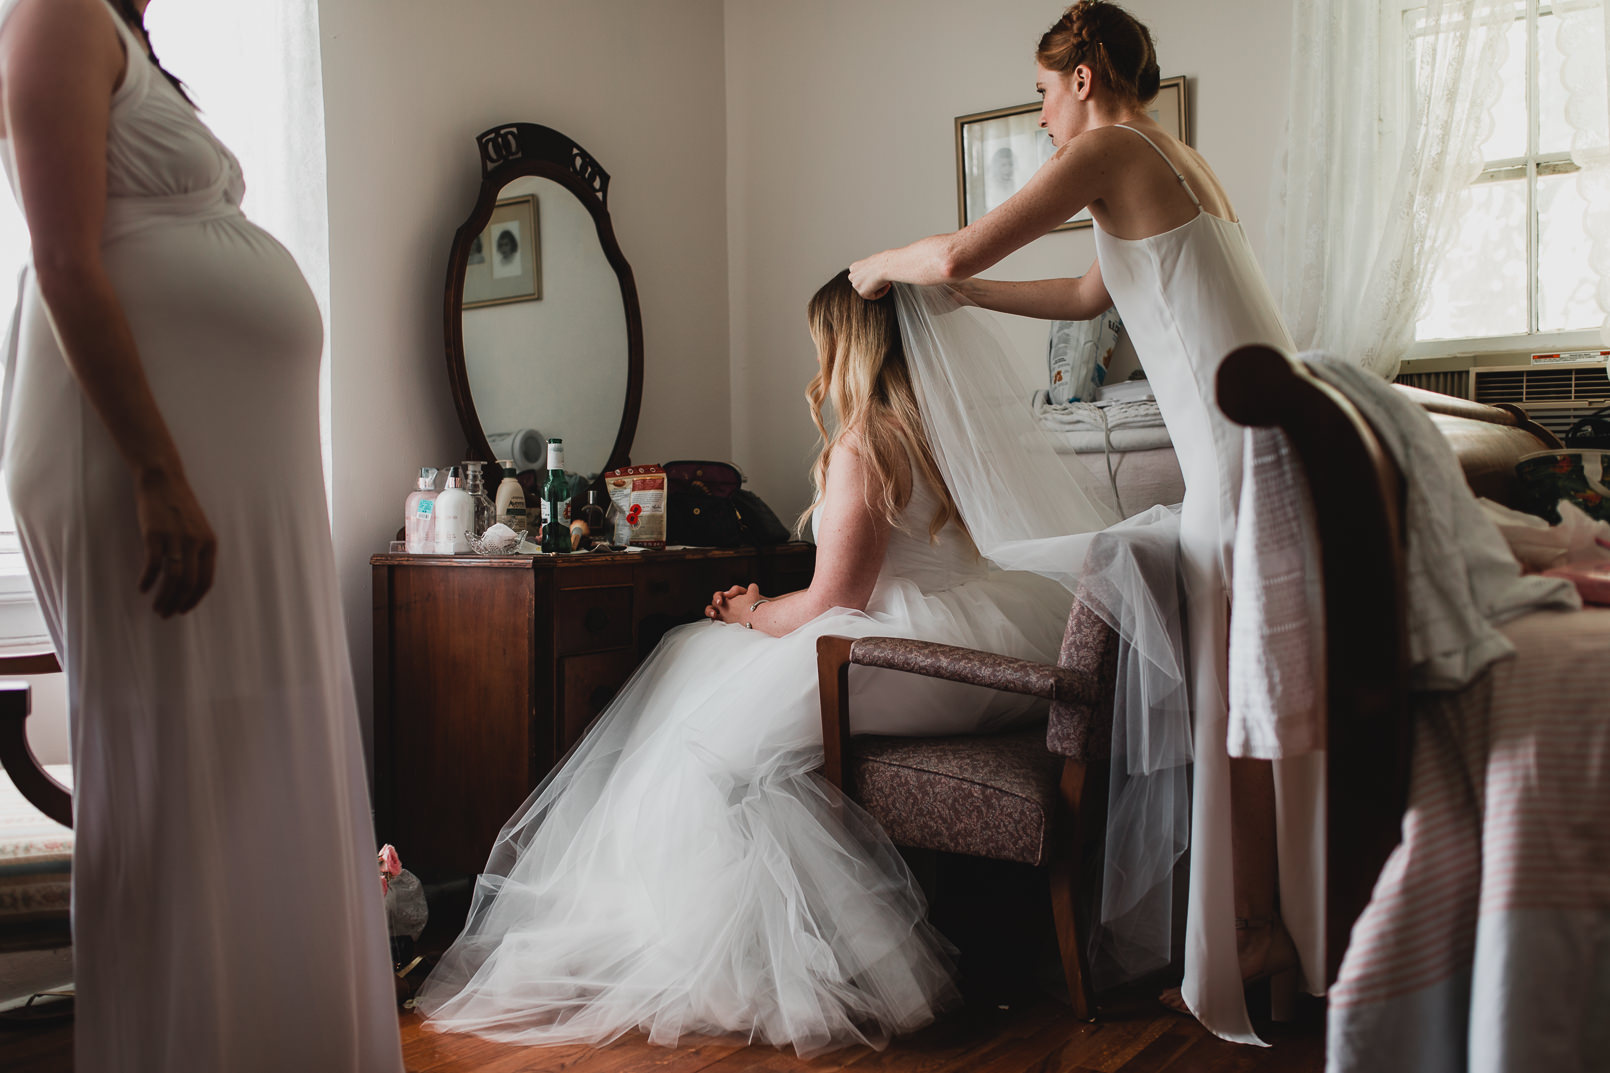 010-Jonathan-Kuhn-Photography-Wedding-_mini.jpg